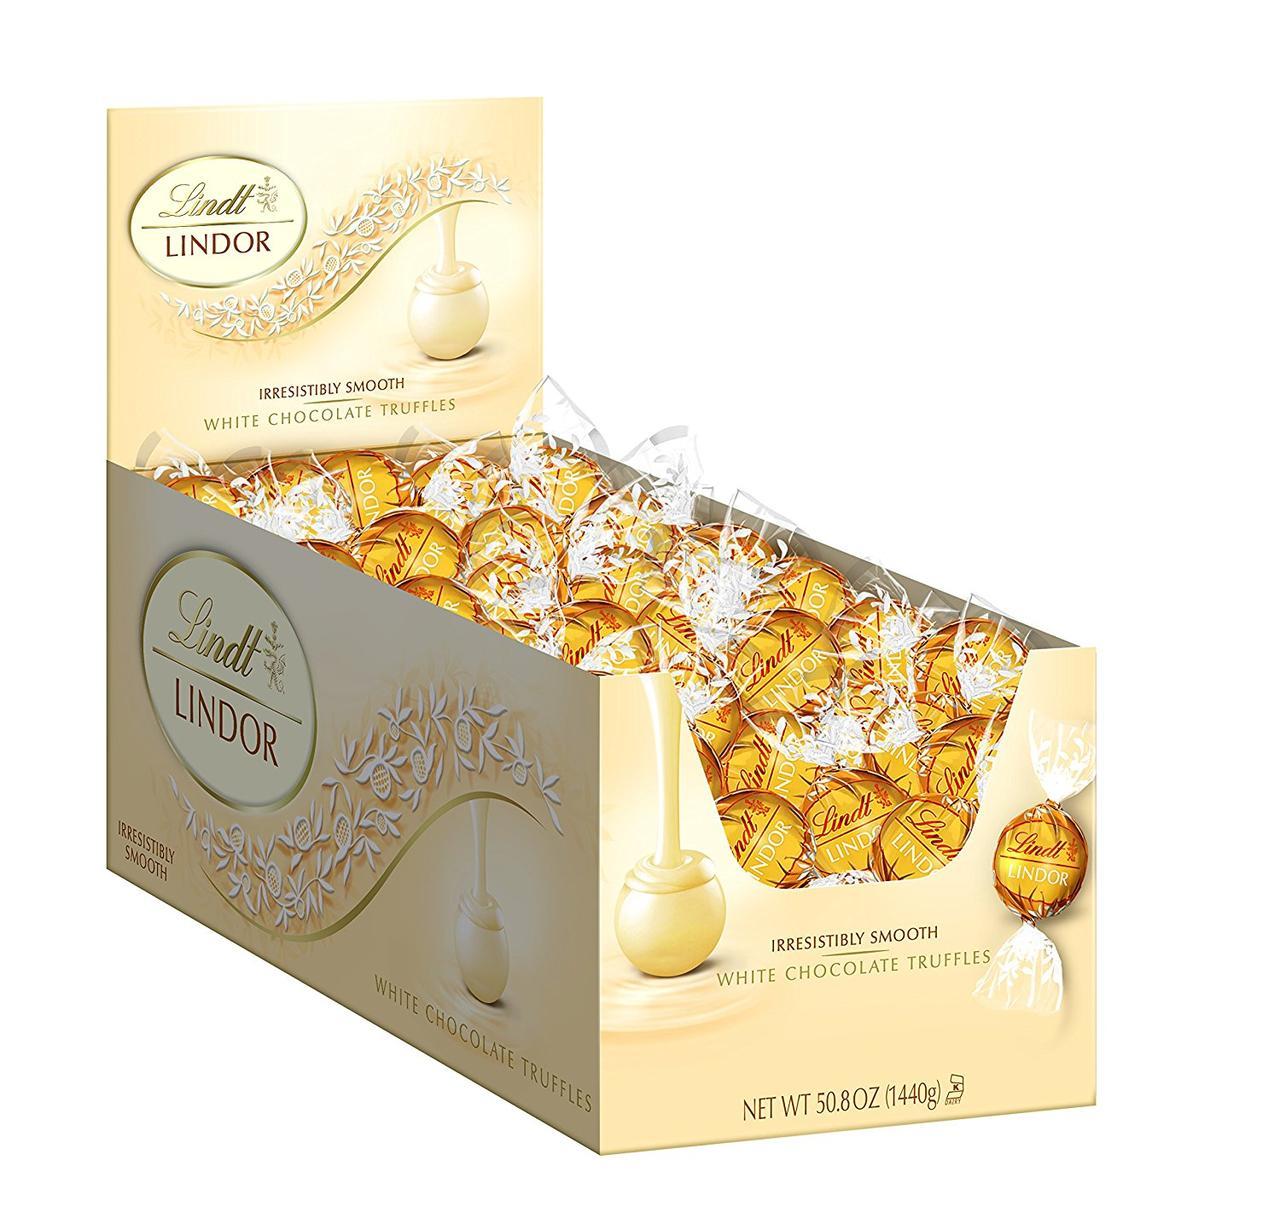 Lindt Lindor Трюфели белый шоколад White Chocolate Truffles, 1440г